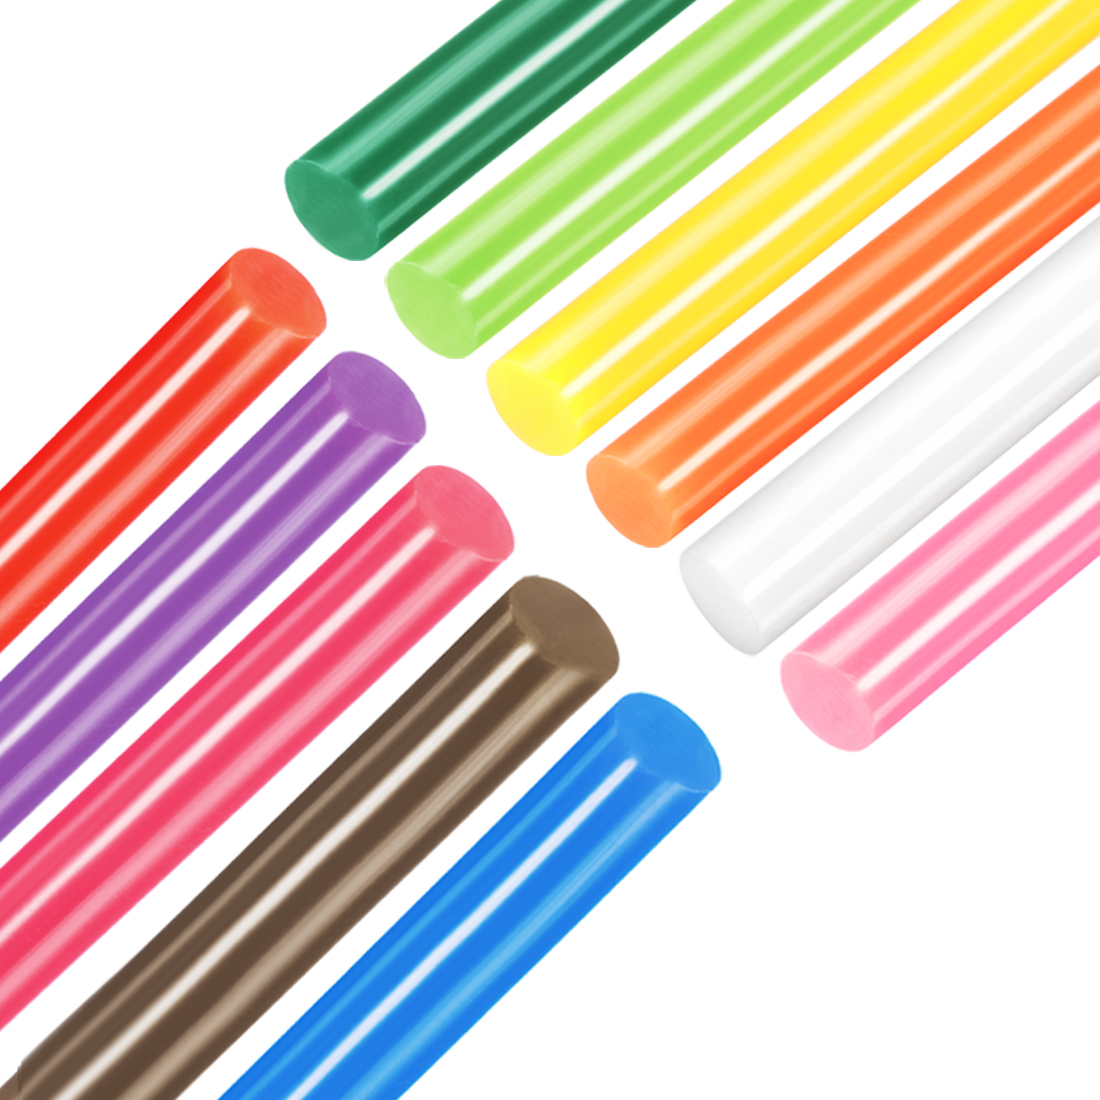 Colorful Hot Melt Glue Gun Sticks, 250mm x 7mm,Use with Most Glue Guns,22pcs